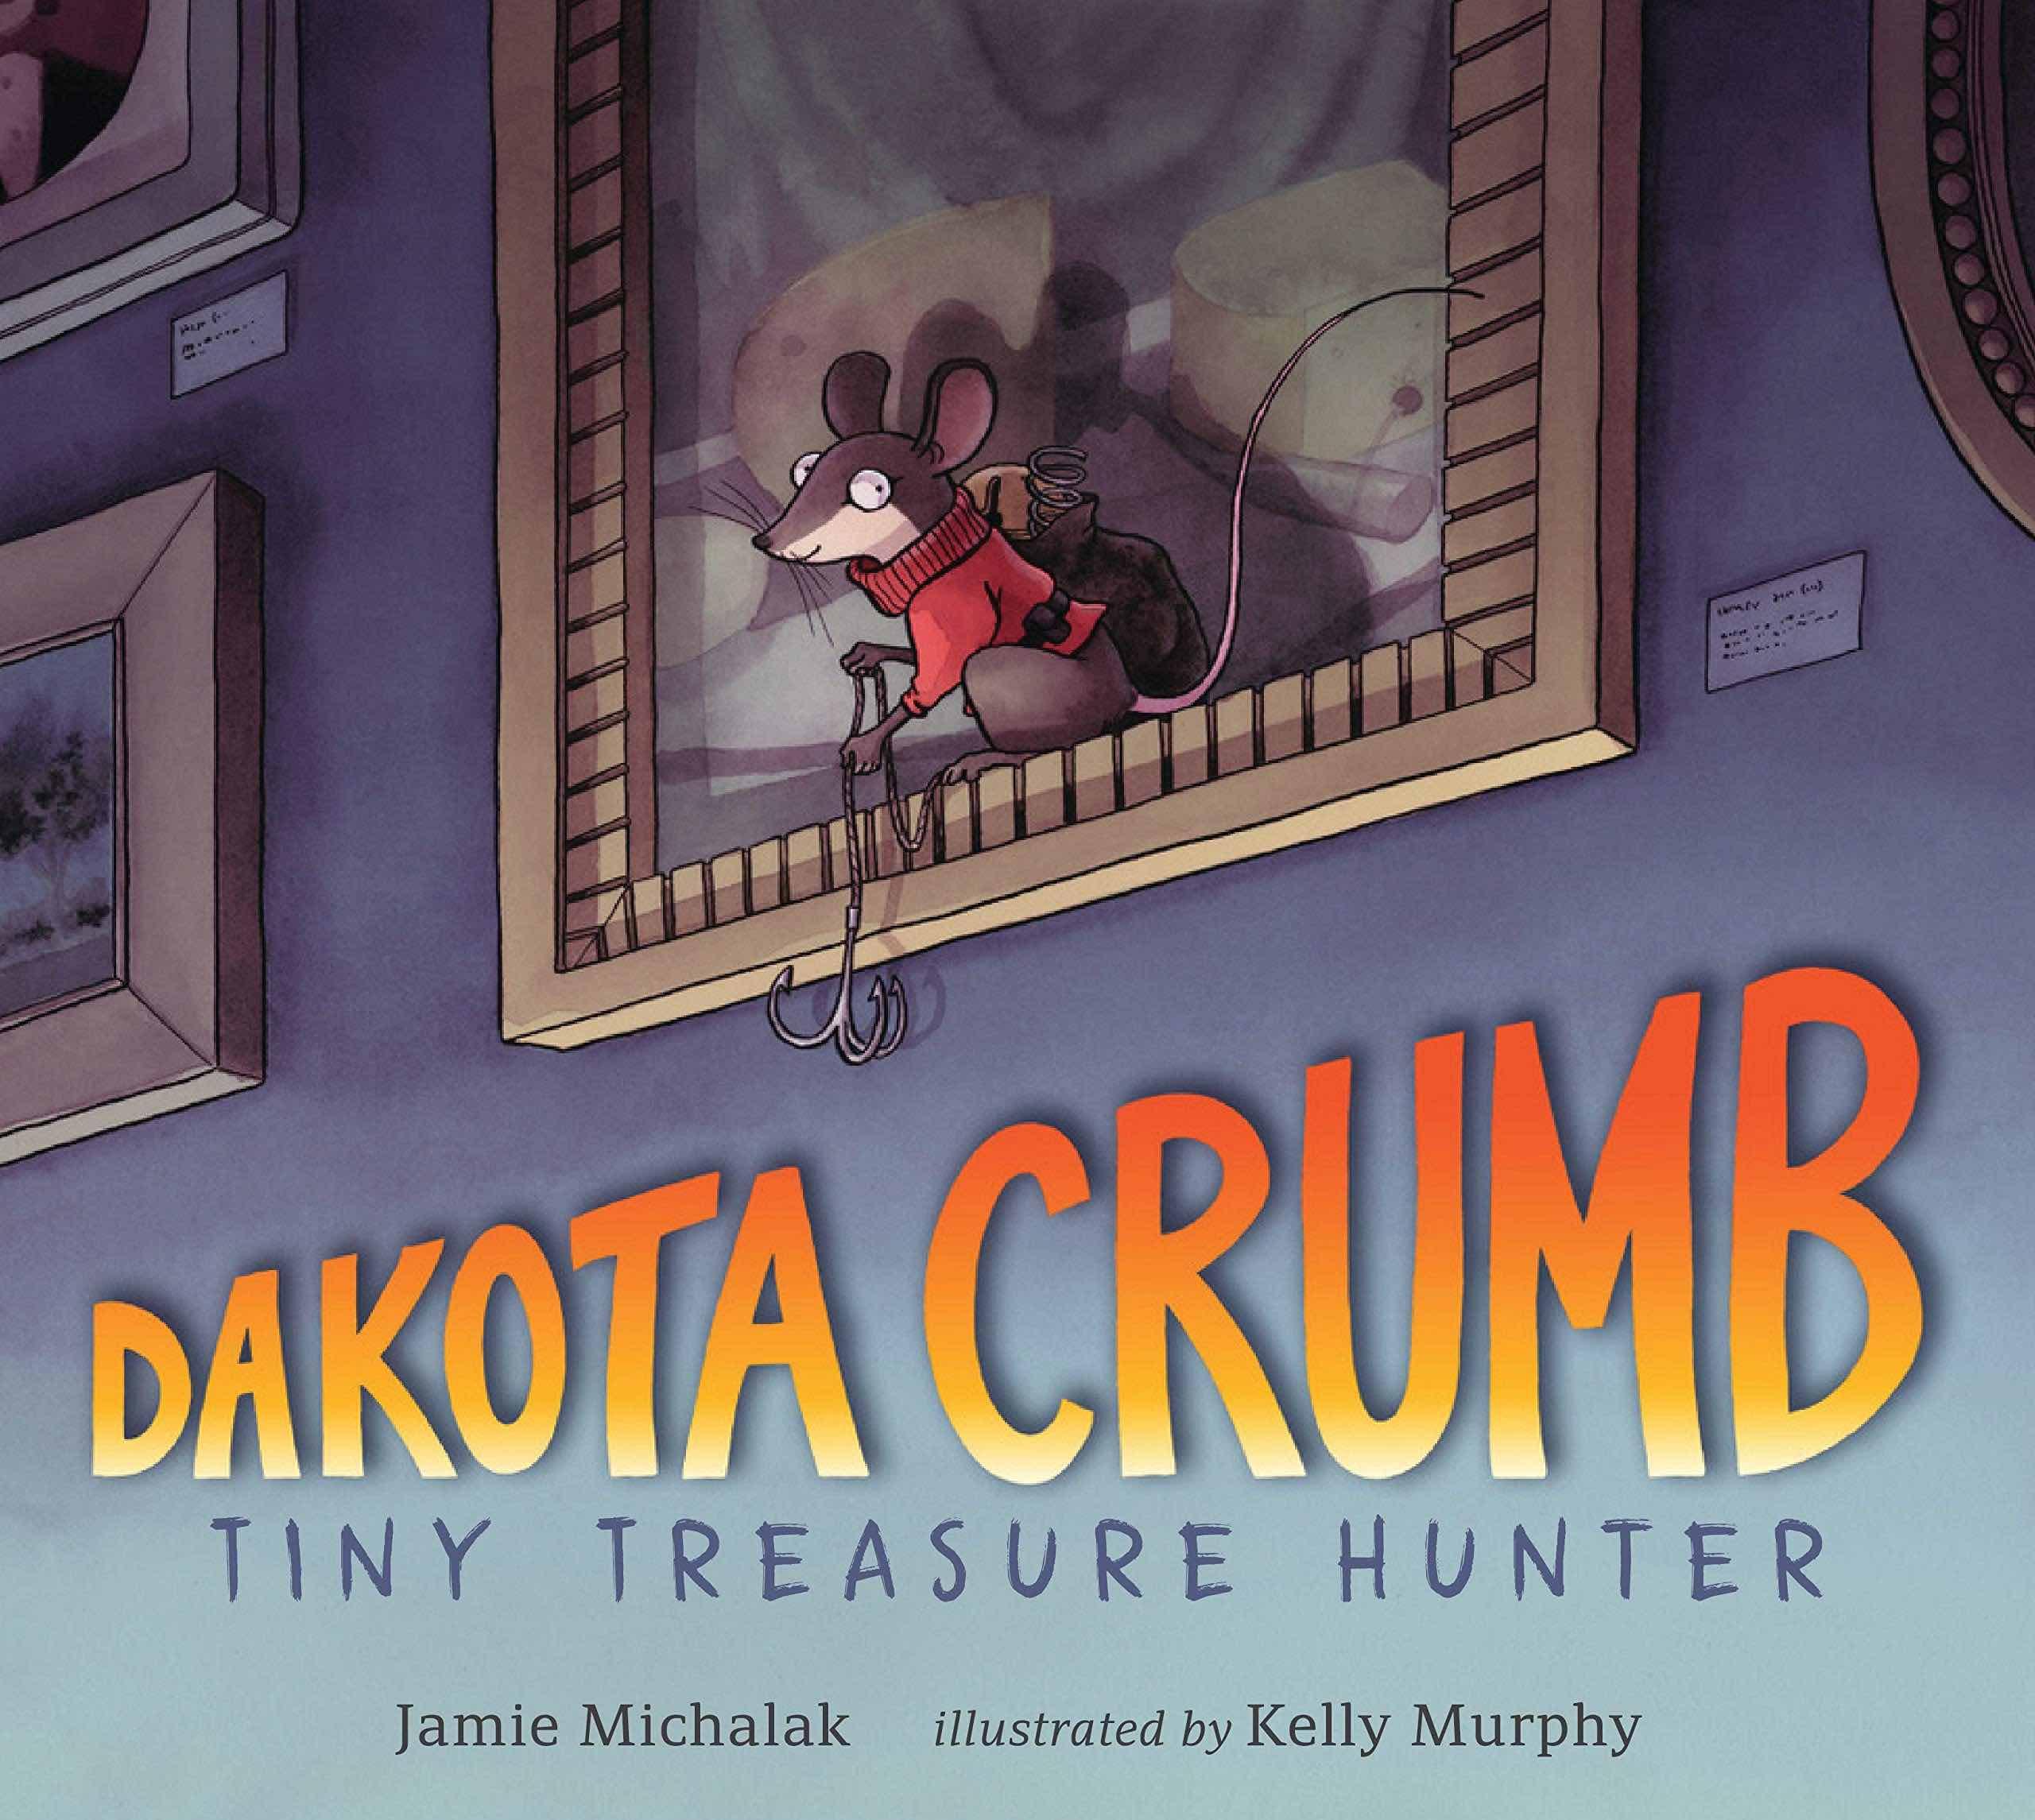 Dakota Crumb Tiny Treasure Hunter